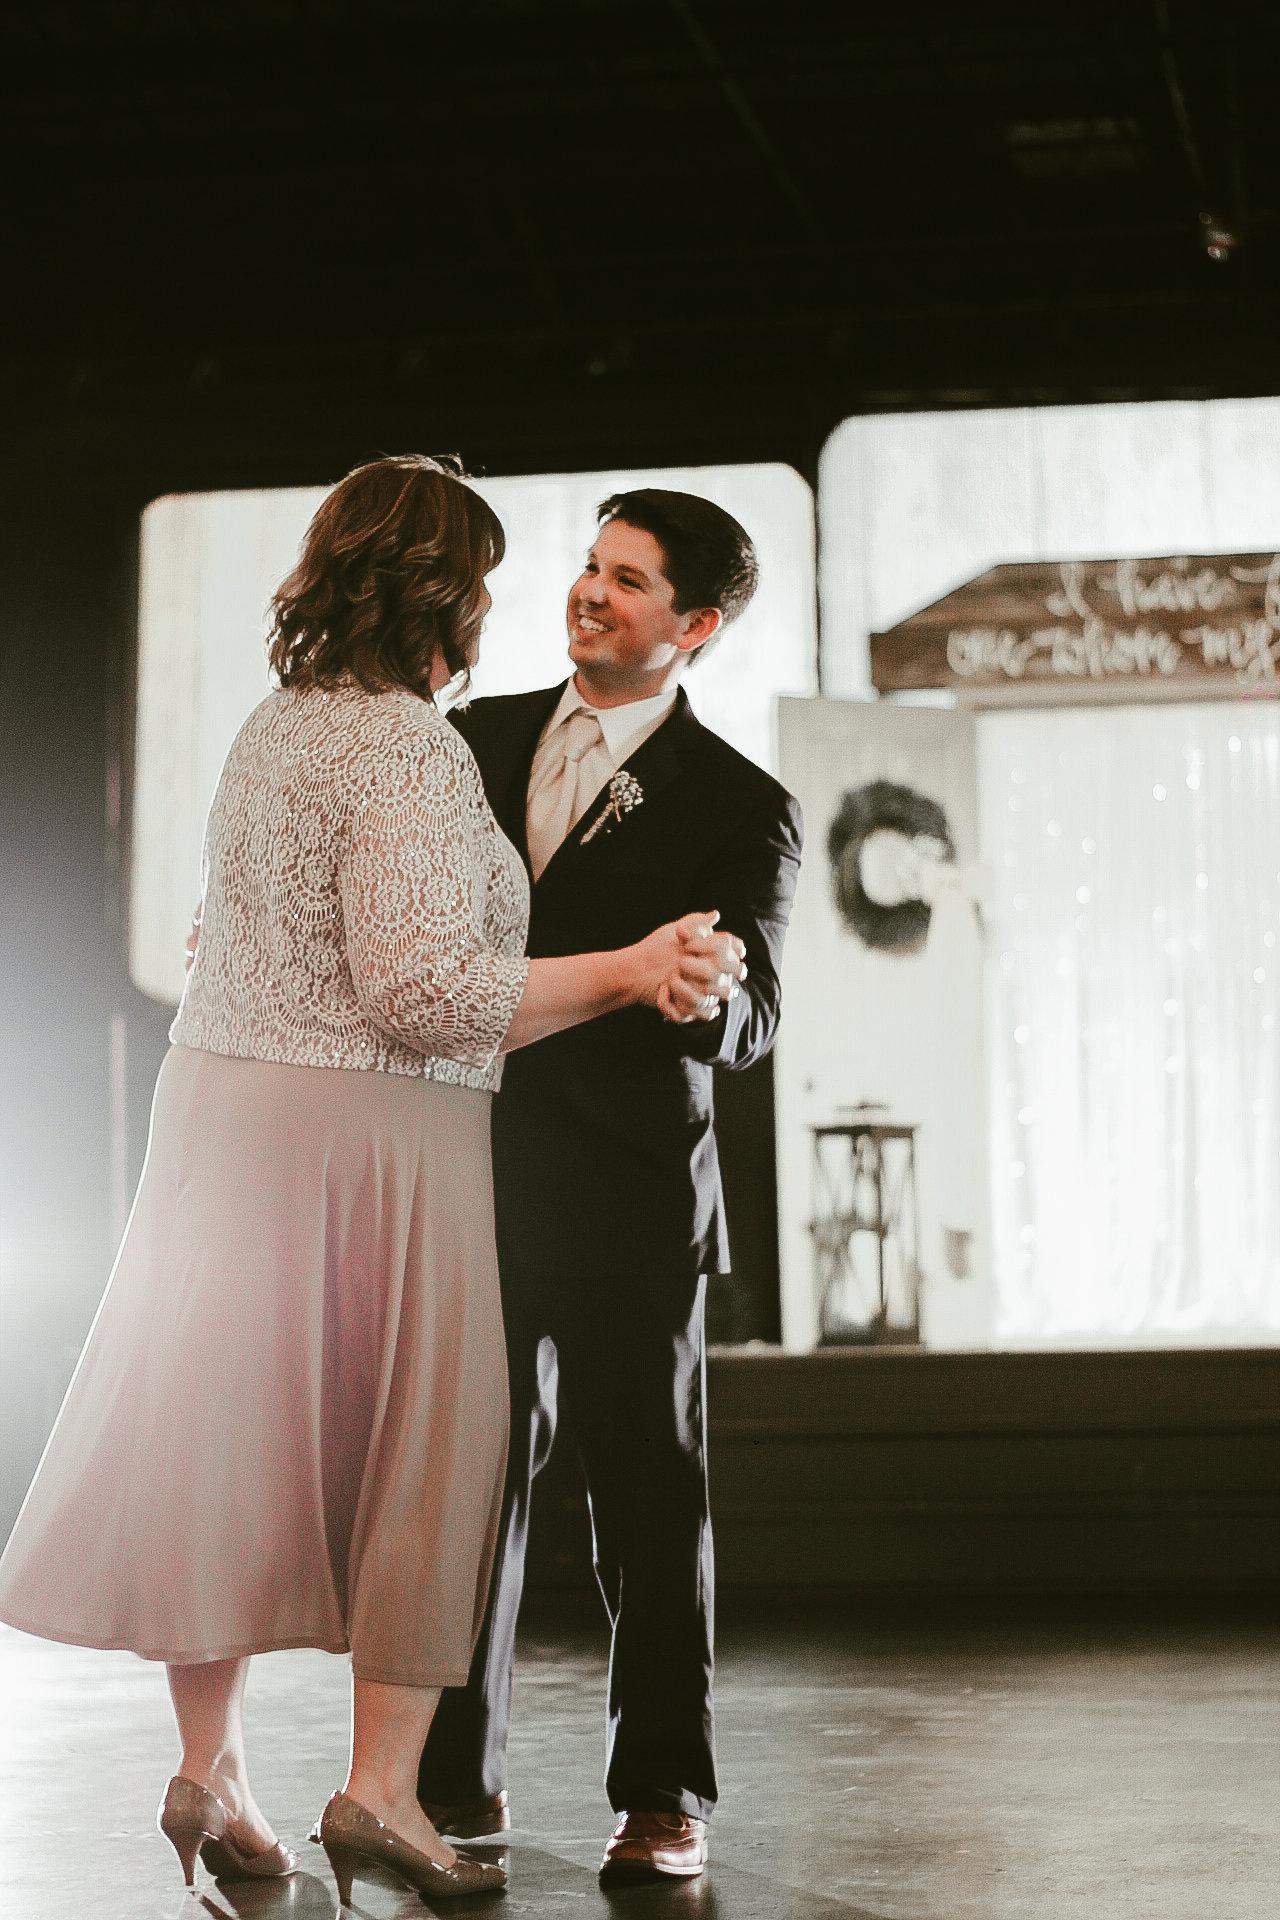 Ansley Wedding-first dance cake cutting-0087.jpg